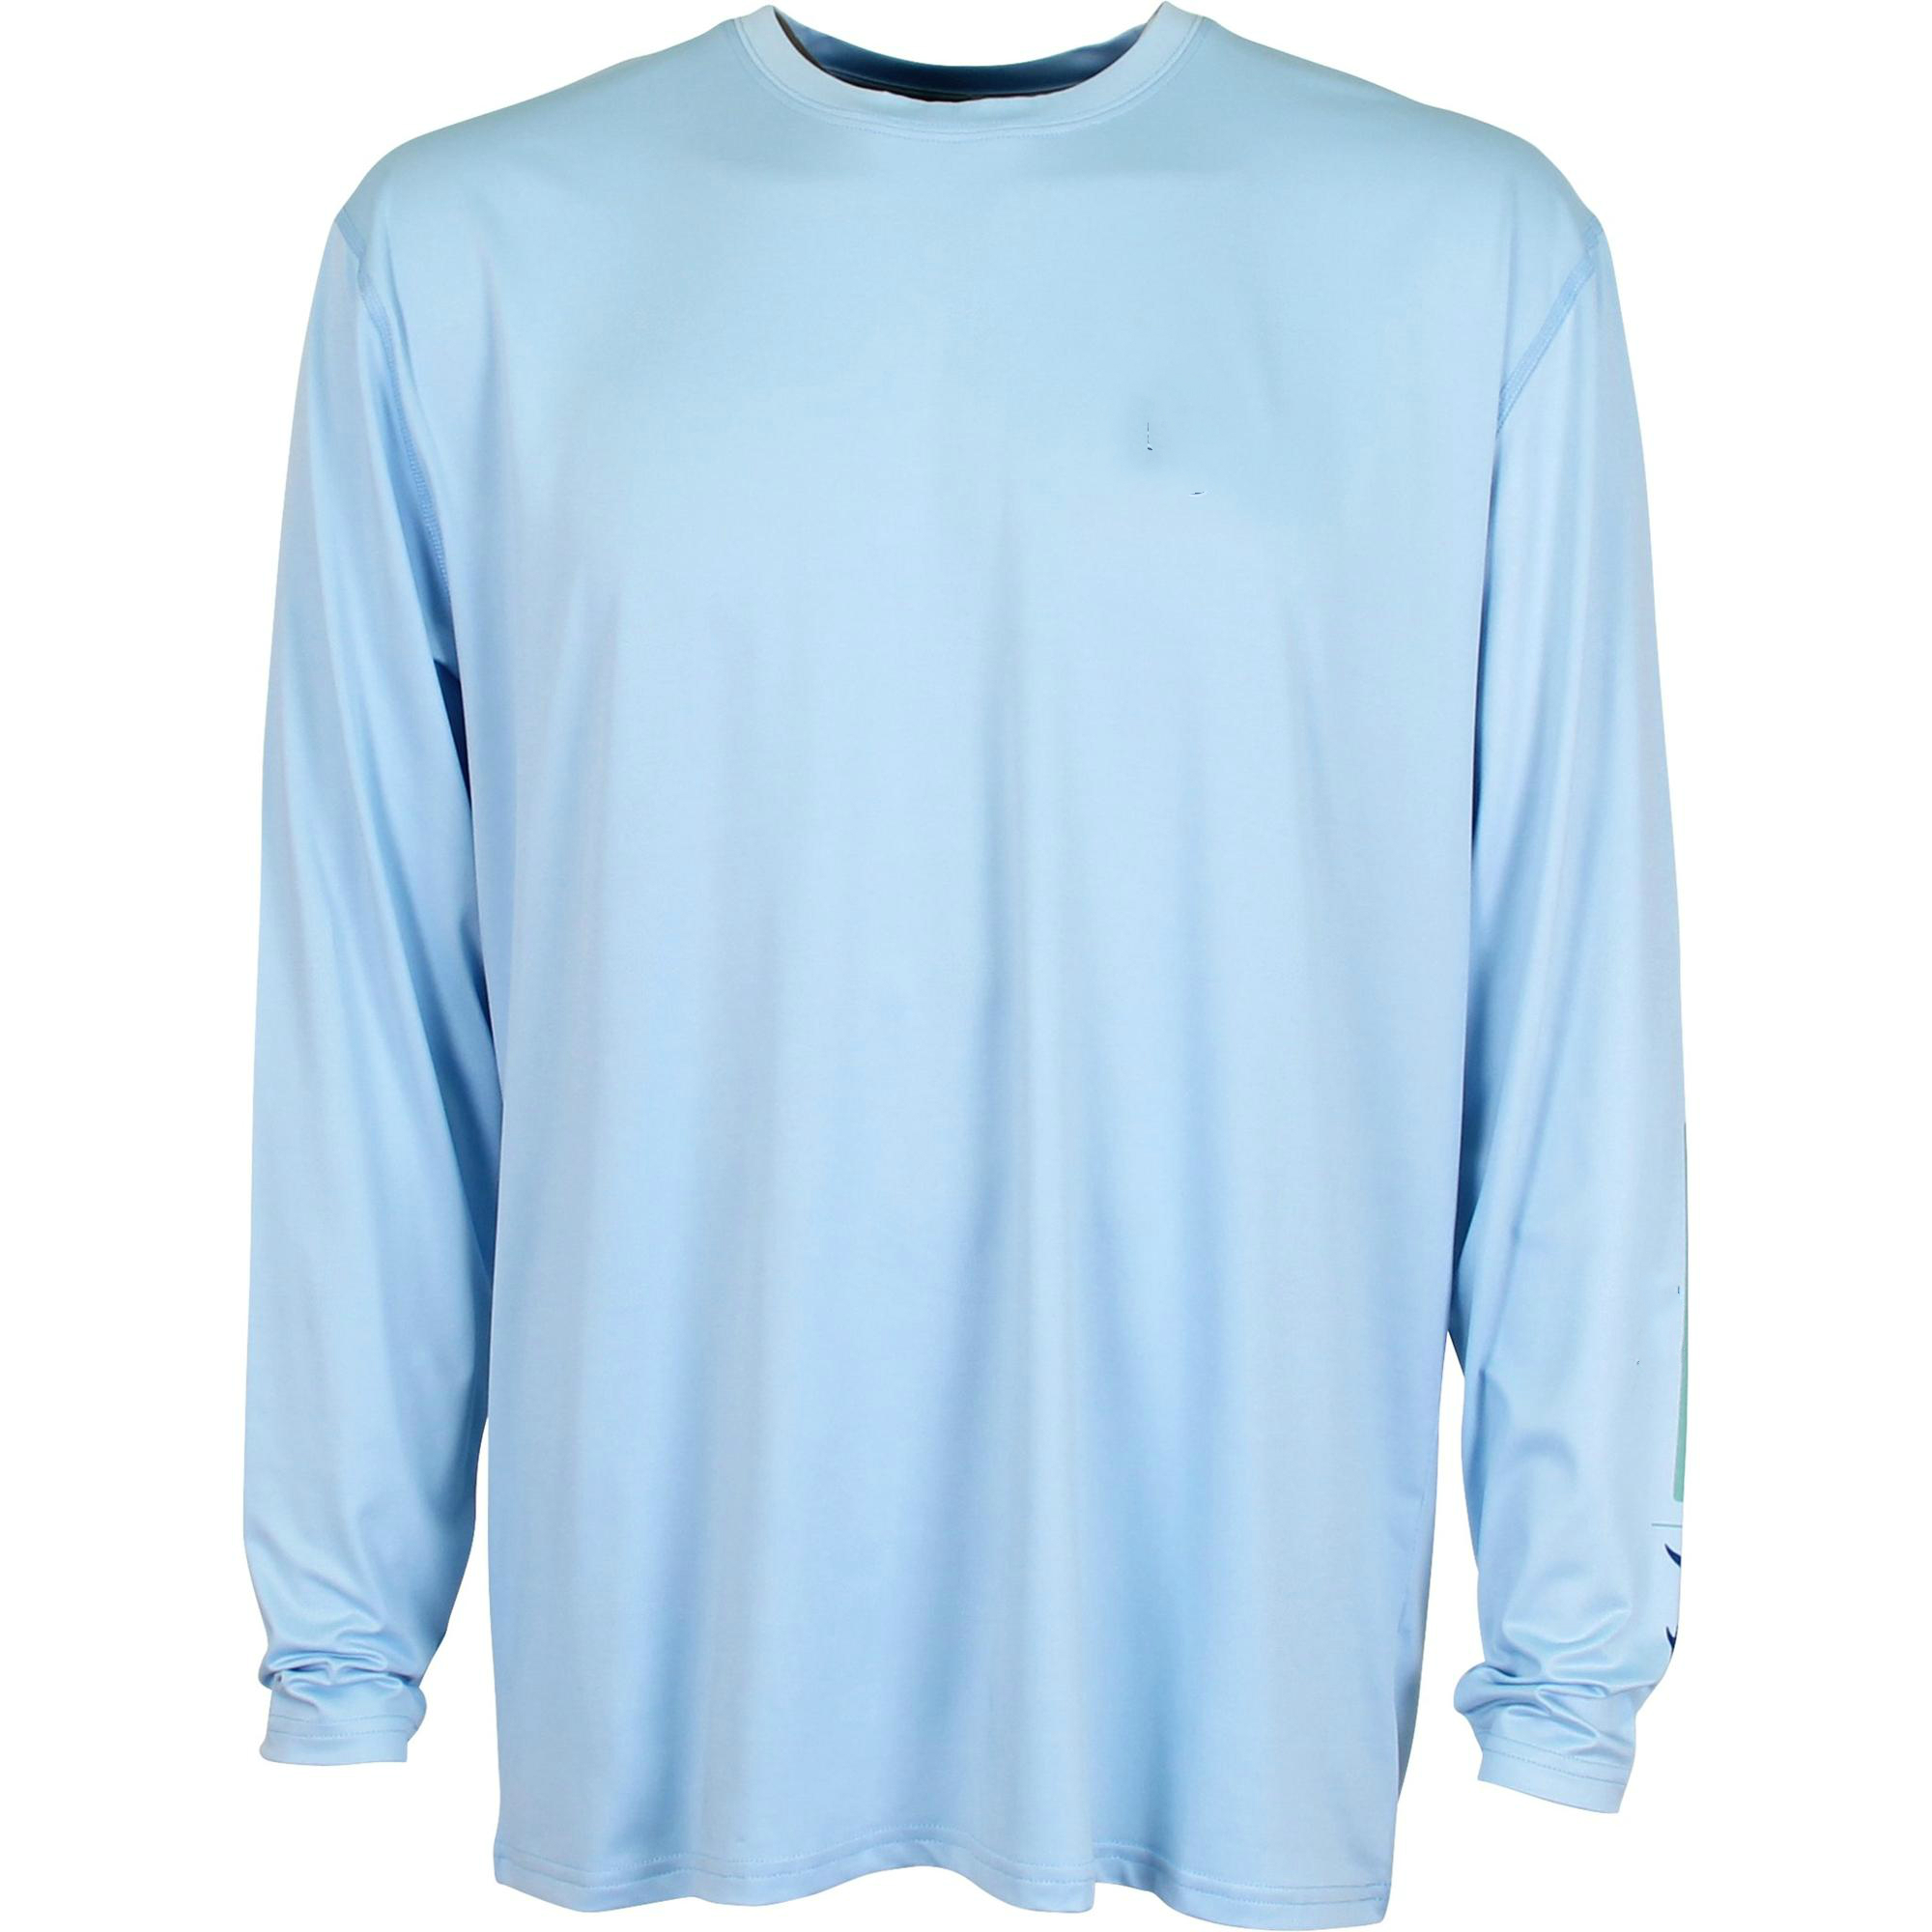 upf50+ performance shirt blank fishing shirts fishing jerseys